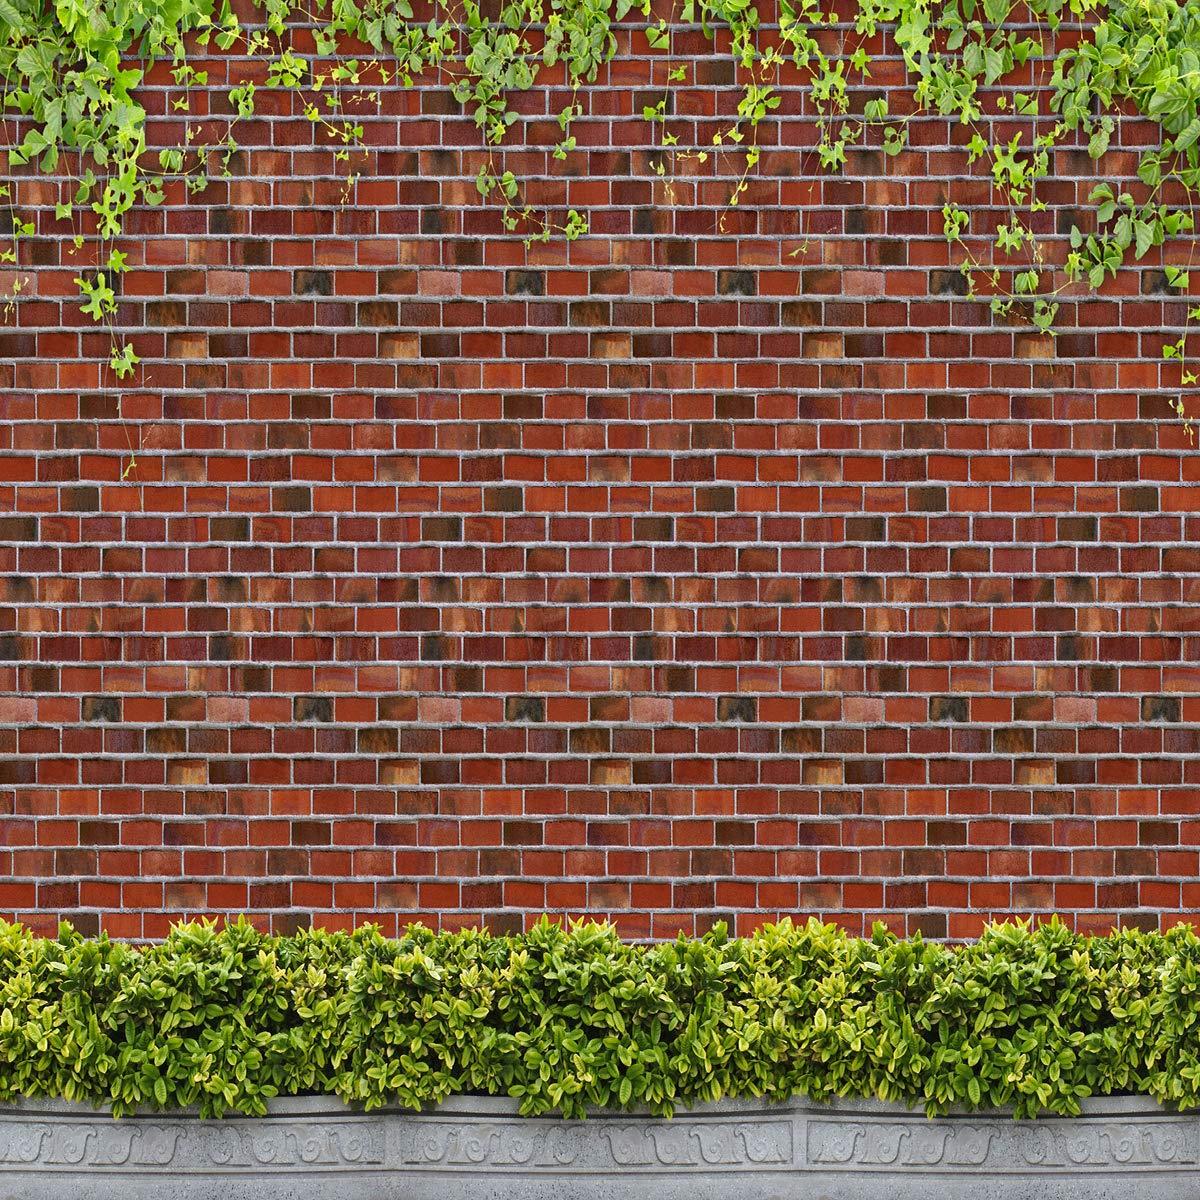 10 x 10フィート ケイトマイクロファイバー 赤レンガ 壁 写真撮影用小道具 背景 芝生 葉 写真 スタジオ 背景 アイビー シームレス ベビーショー 写真用背景幕   B07L7ZHZ2V